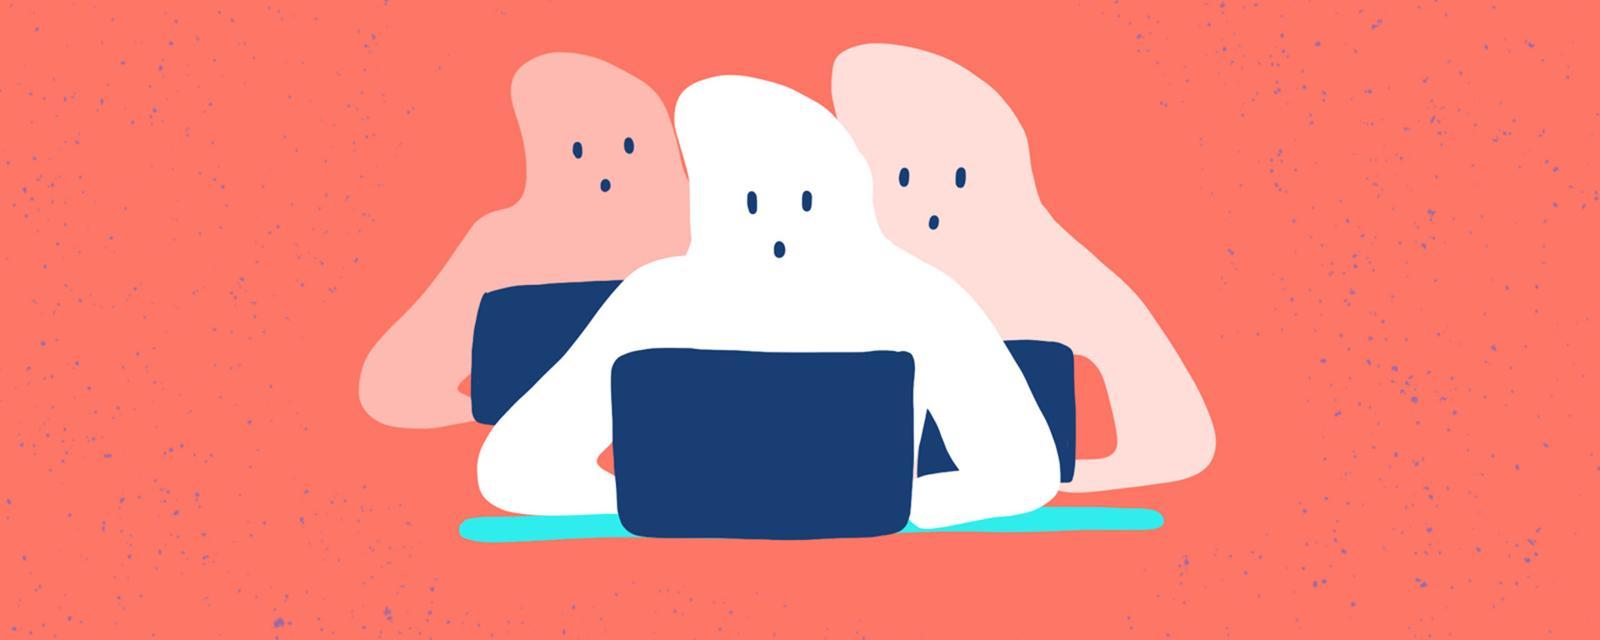 >The 'ghost work' powering tech magic